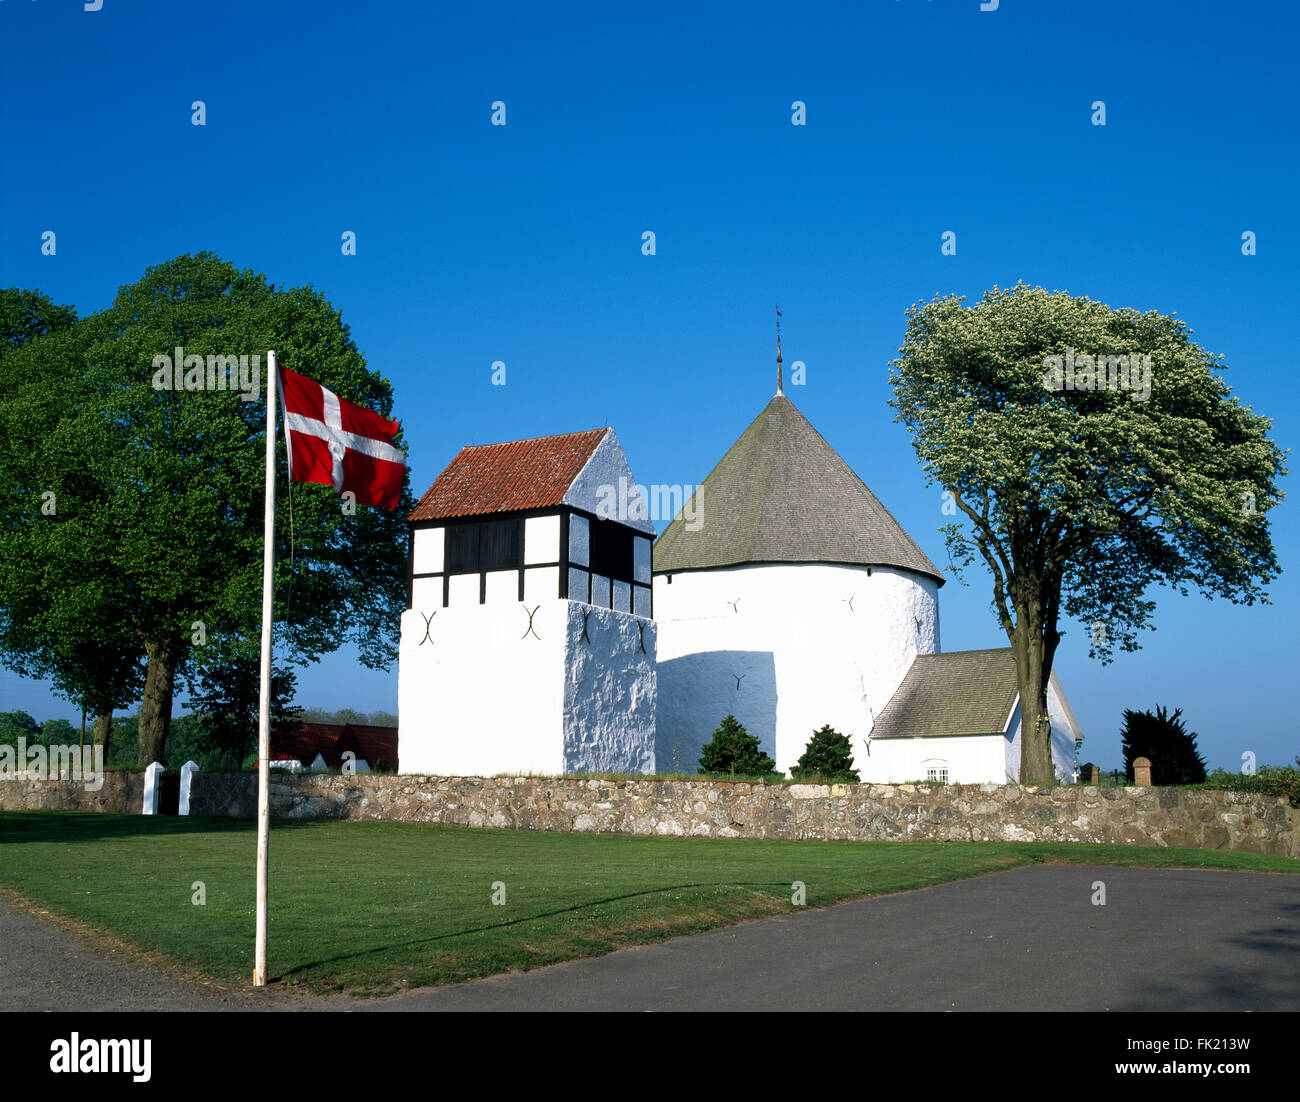 Nylars church,  Bornholm island, Denmark, Scandinavia, Europe - Stock Image